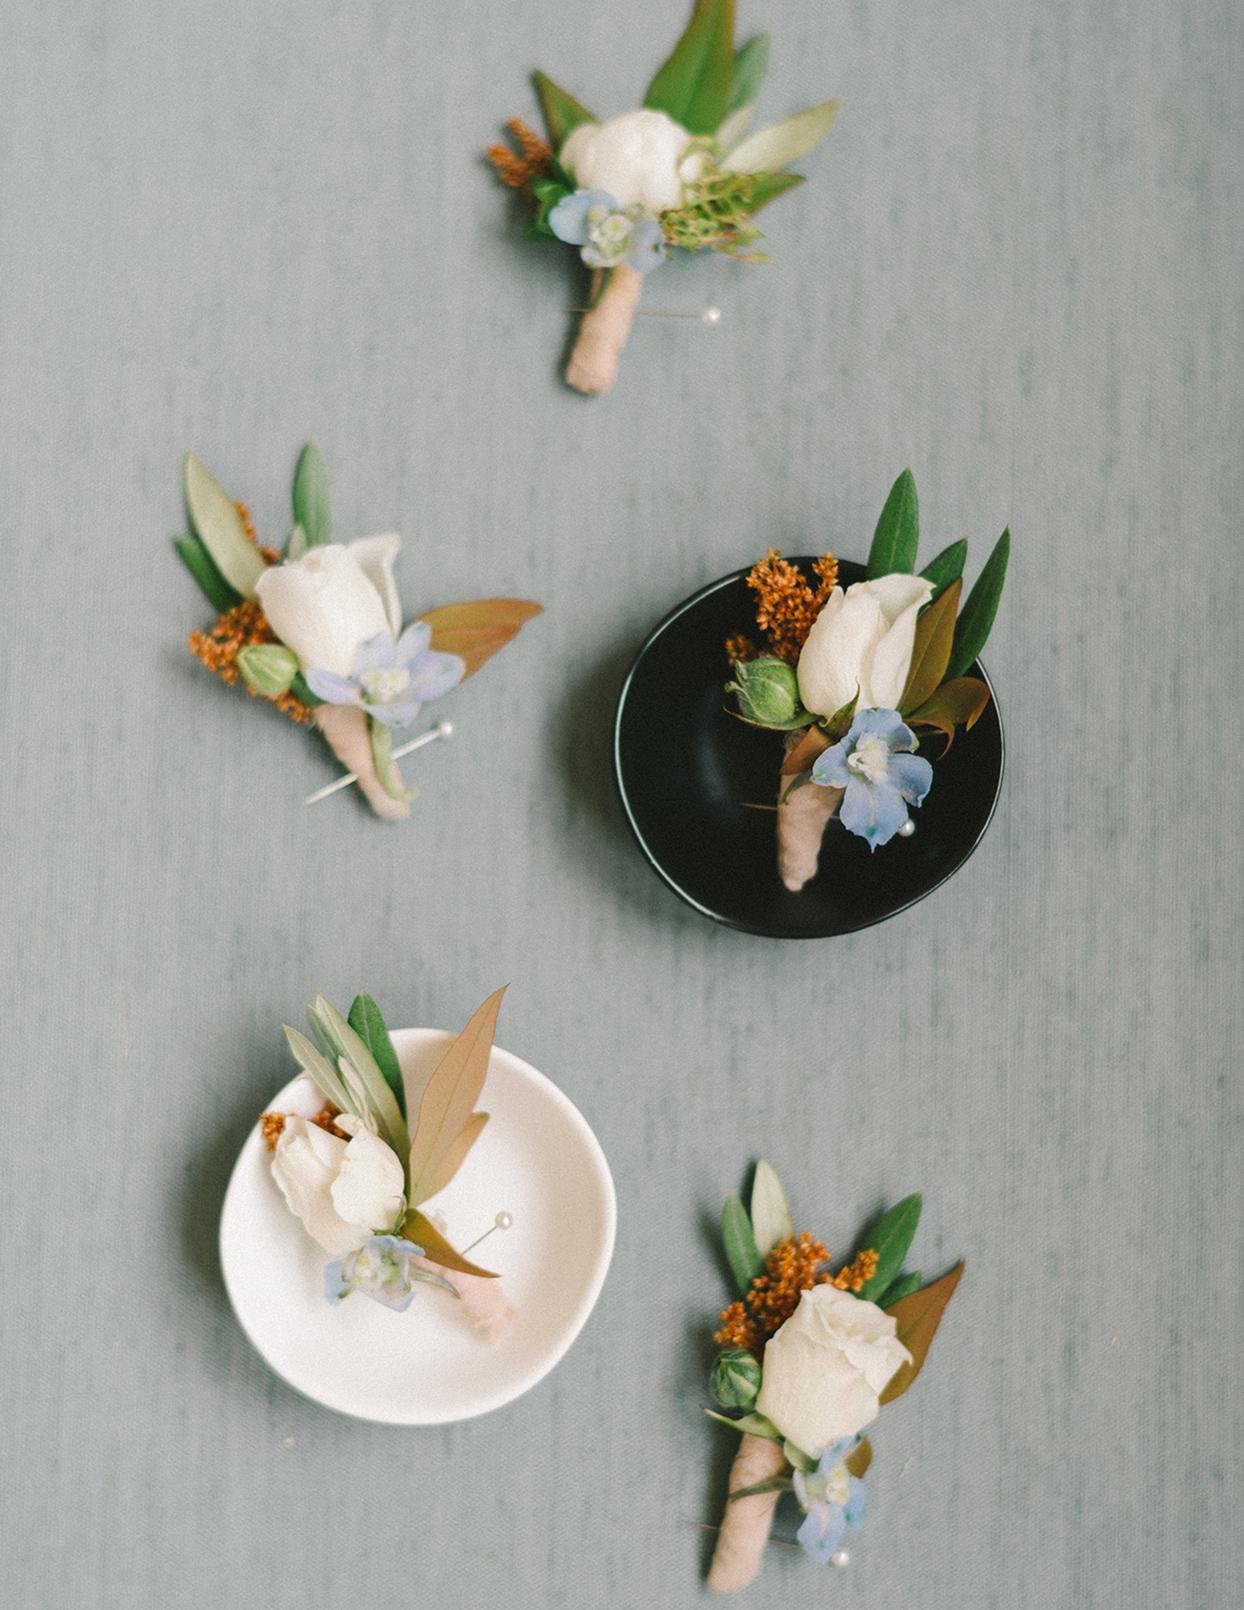 ericka meechaeyl wedding boutonnieres on decorative dishes